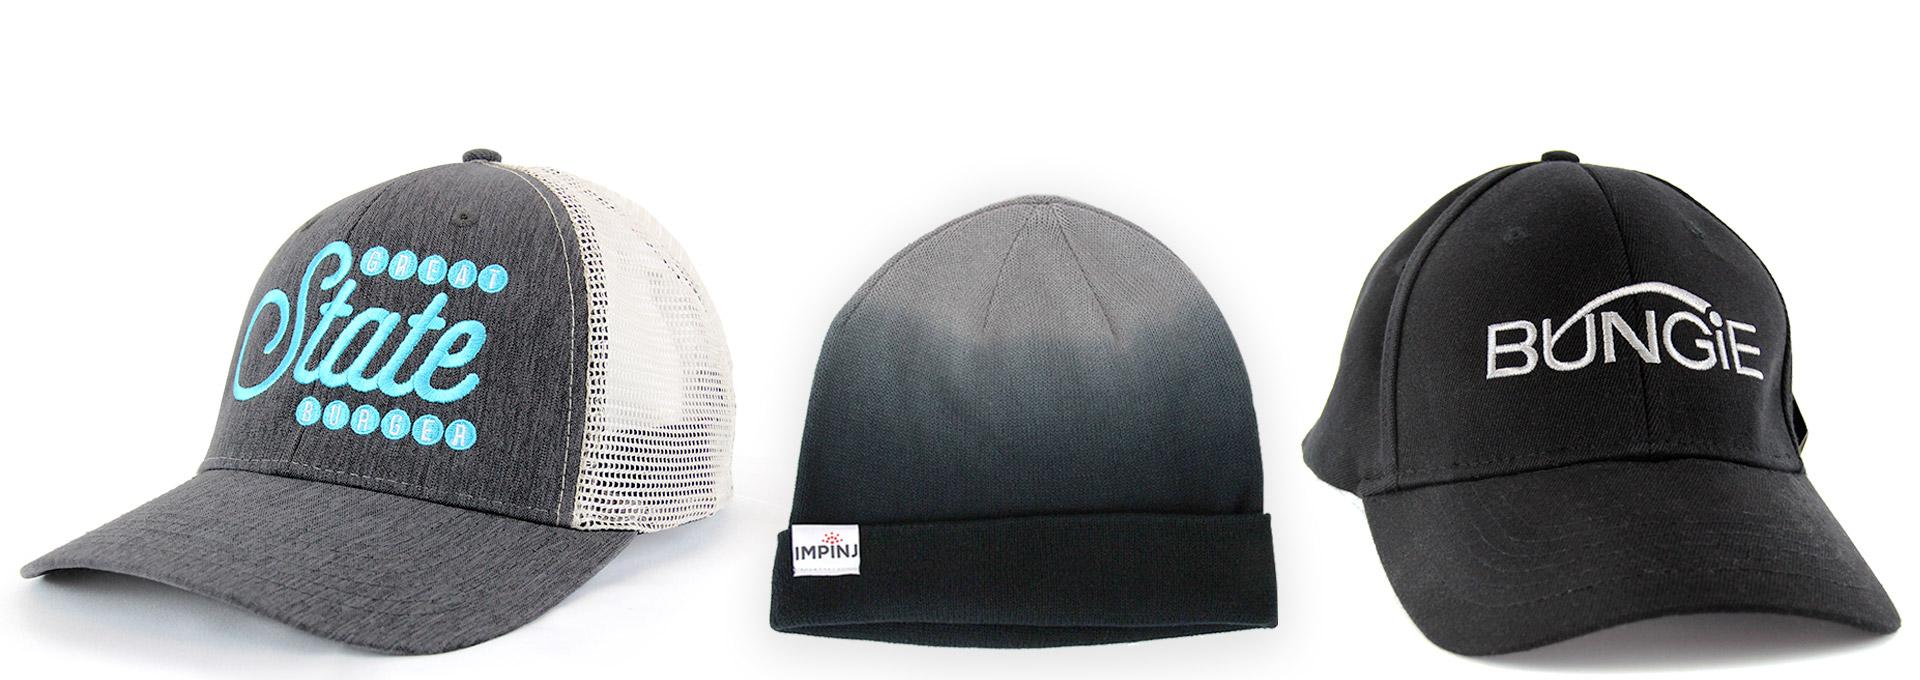 80f1239c Hats Custom Printed Seattle | B-BAM Seattle Custom Promotional ...